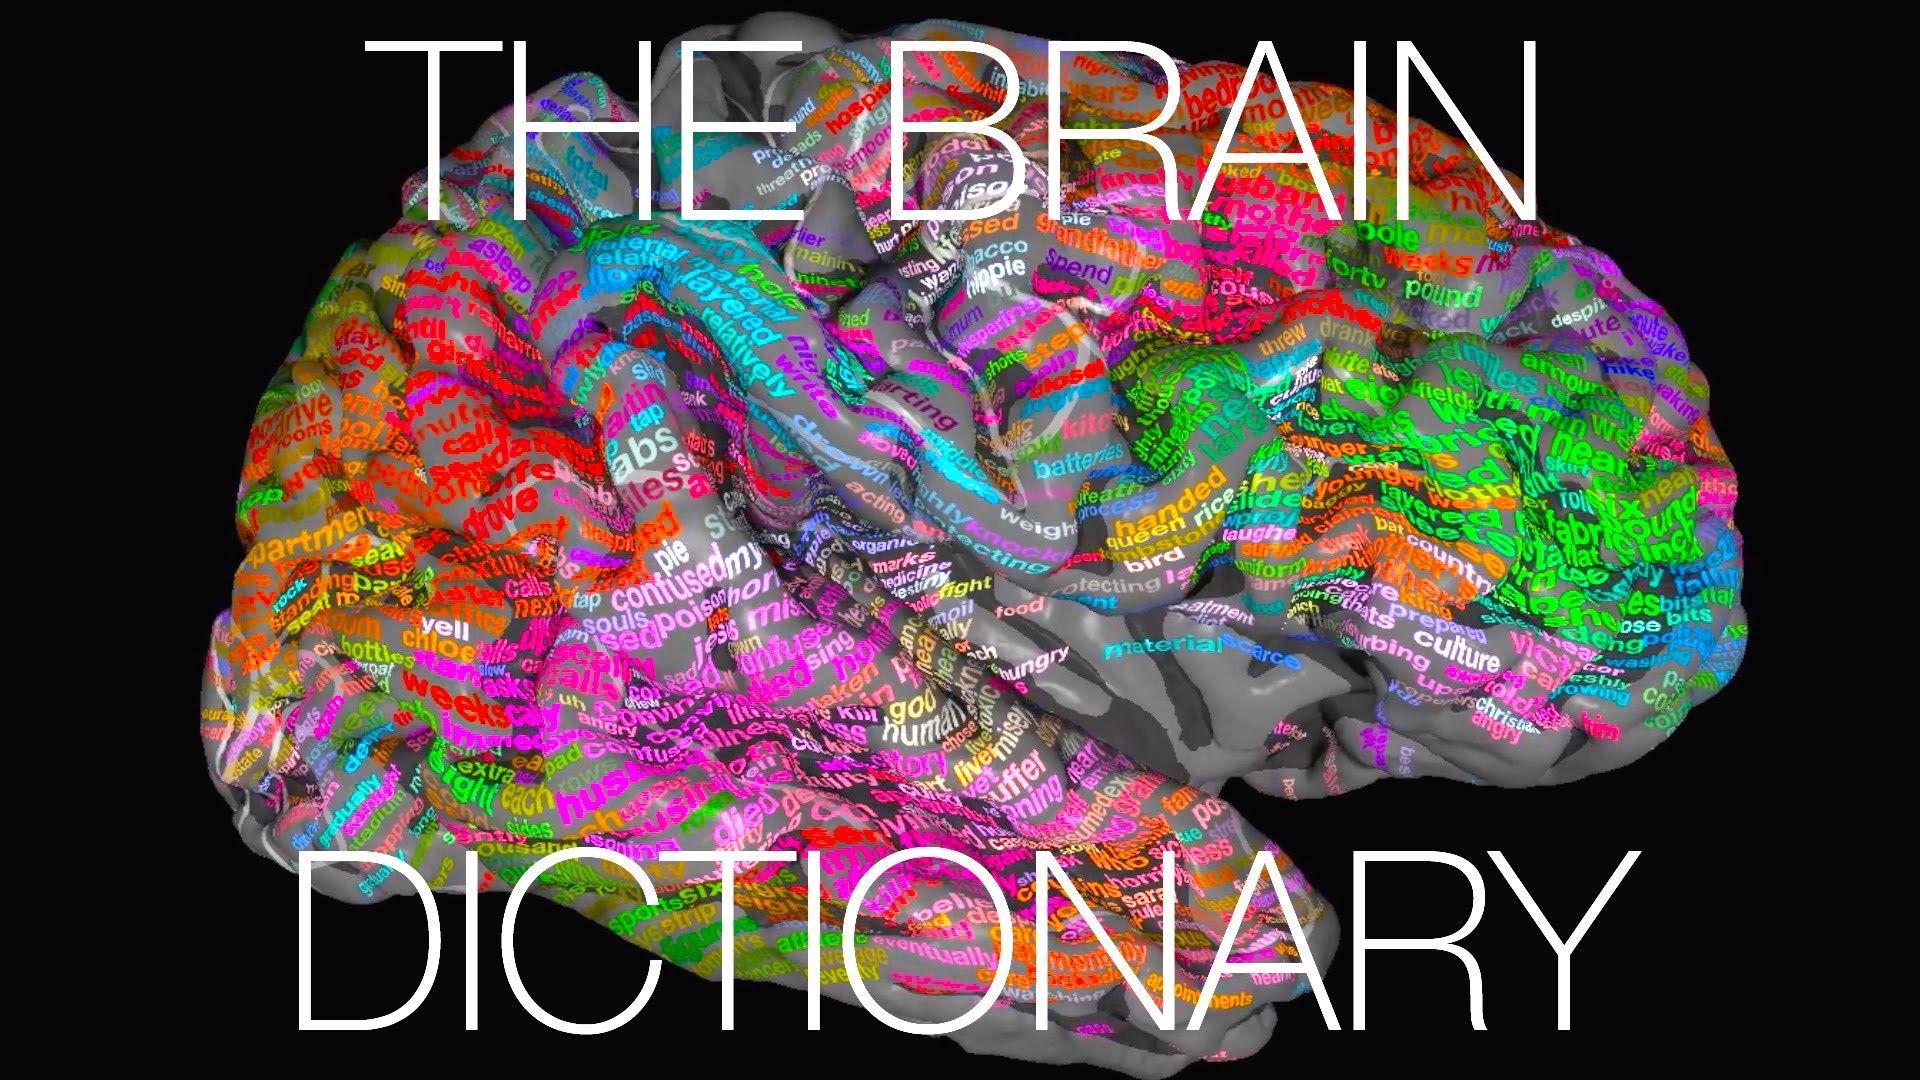 The brain dictionary   Ciencia - Tecnologia - Salud   Pinterest ...